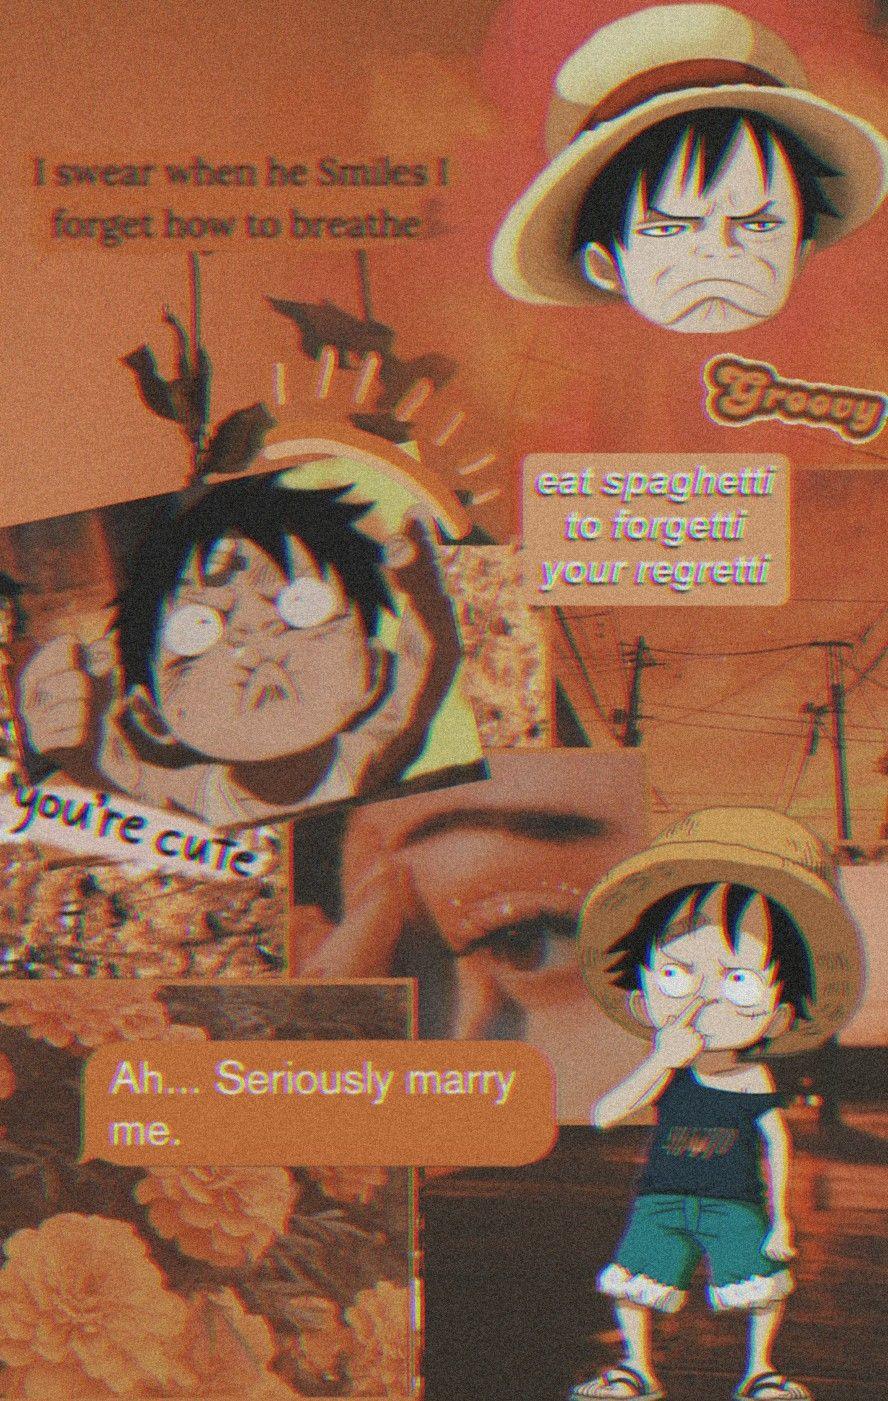 Monkey D Luffy Aesthetic Wallpaper In 2020 Manga Anime One Piece Cute Anime Wallpaper One Piece Anime